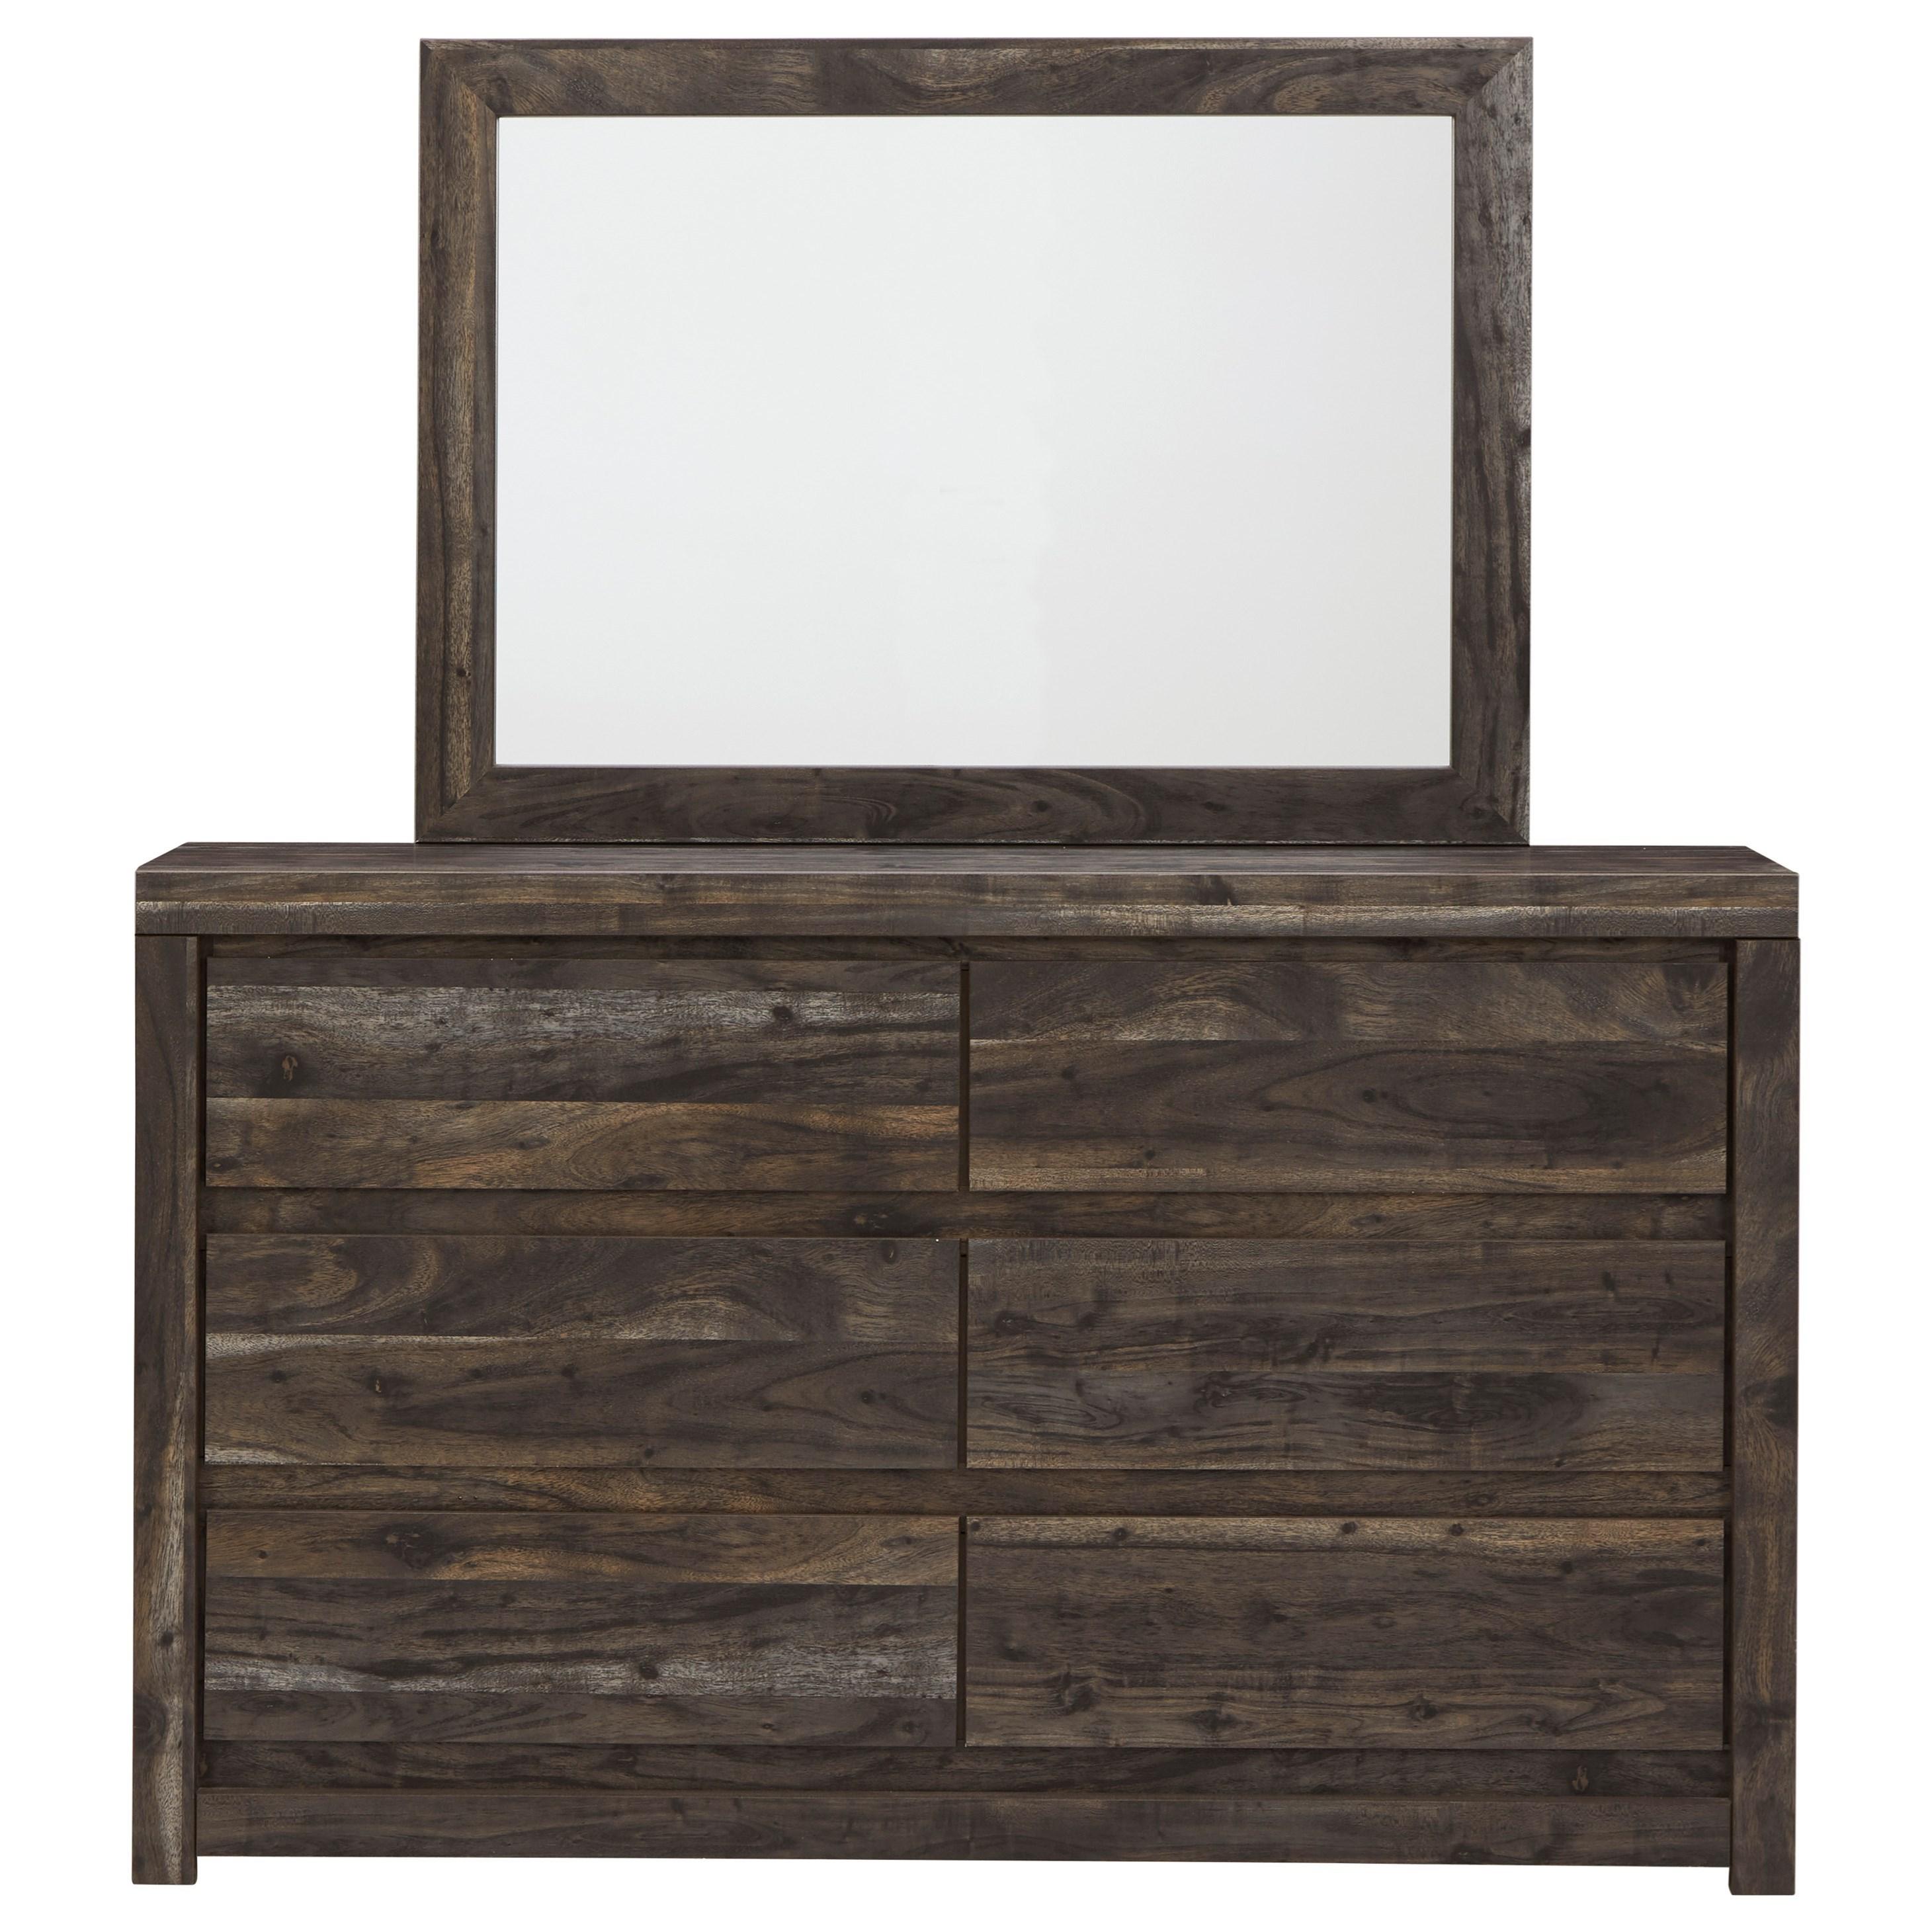 Vay Bay Dresser & Mirror by Benchcraft at Walker's Furniture